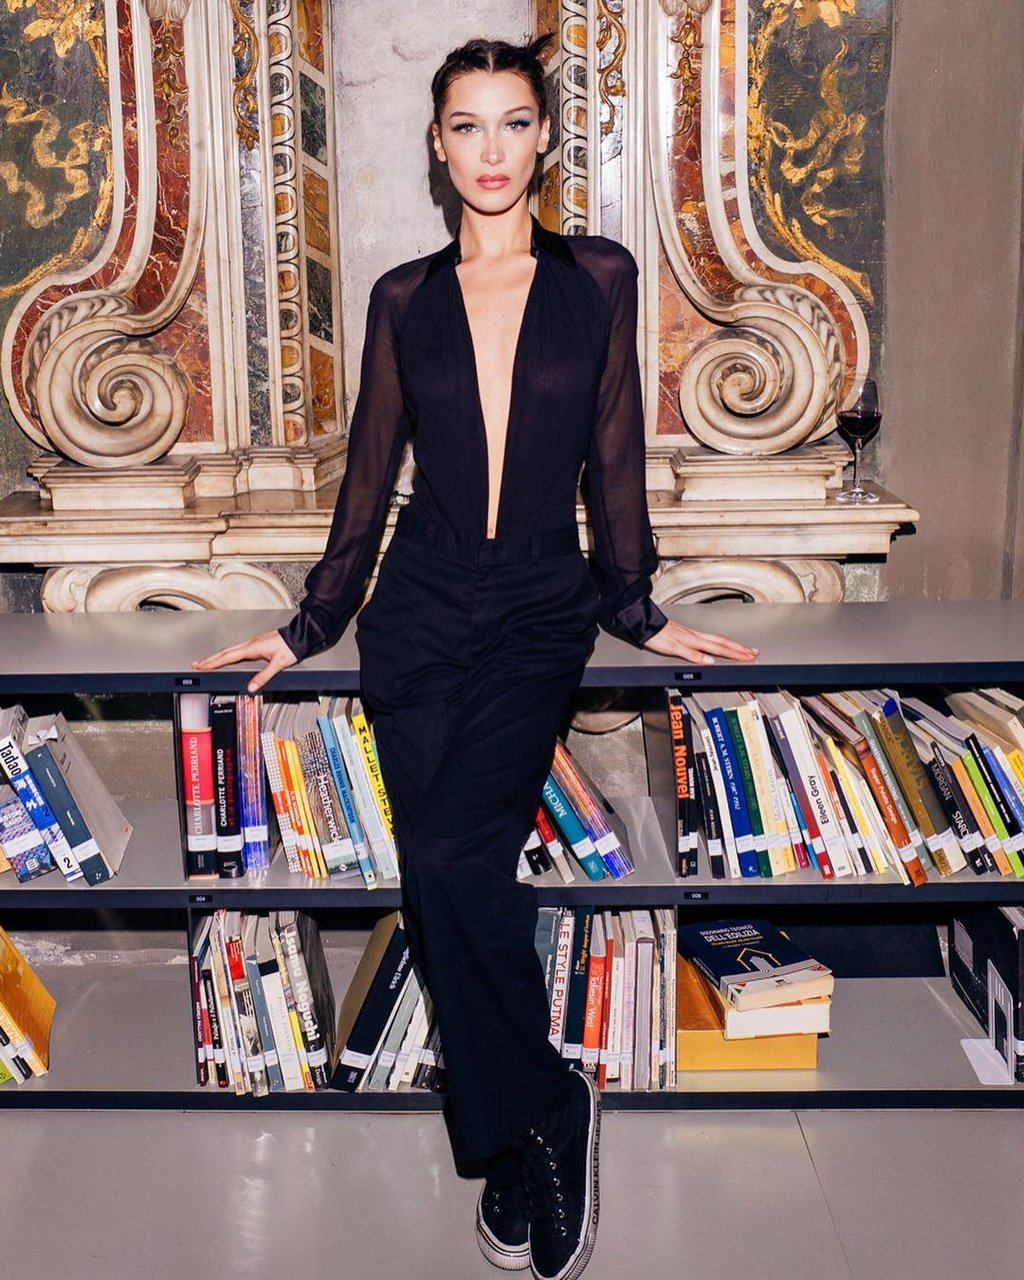 pants black top plunge v neck bella hadid model off-duty fashion week